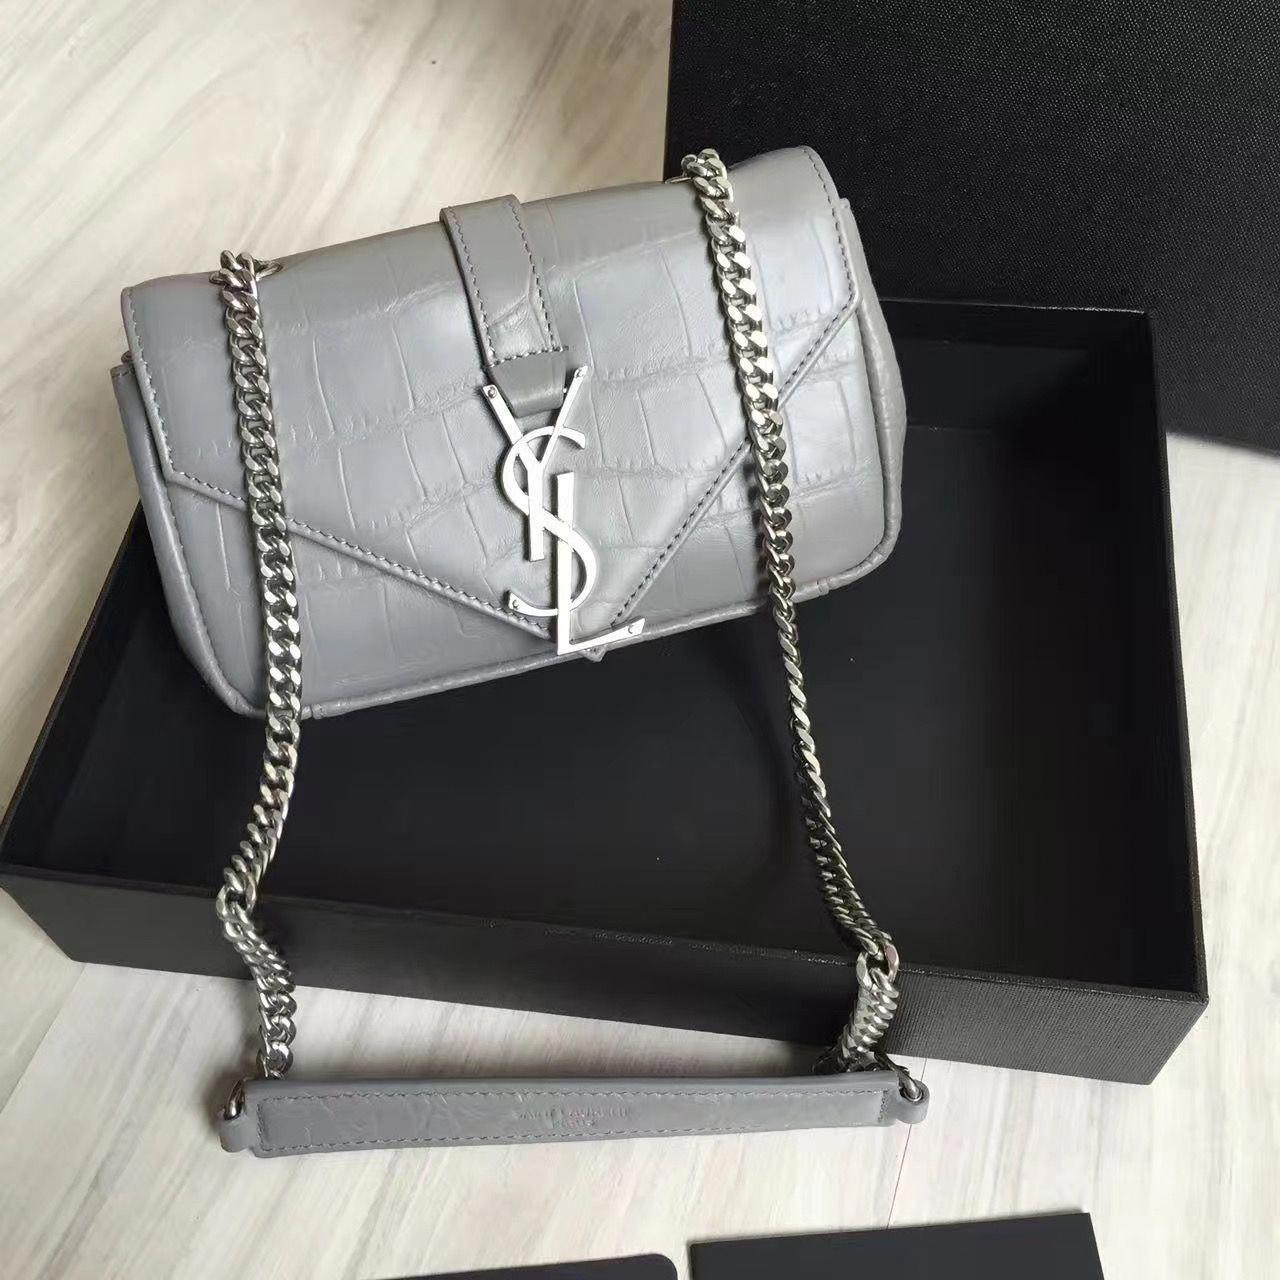 Saint Laurent Classic Baby Monogram Chain Bag In Crocodile Pattern Calfskin  Gray 399289  Designerhandbags 4f42cce60e0ca